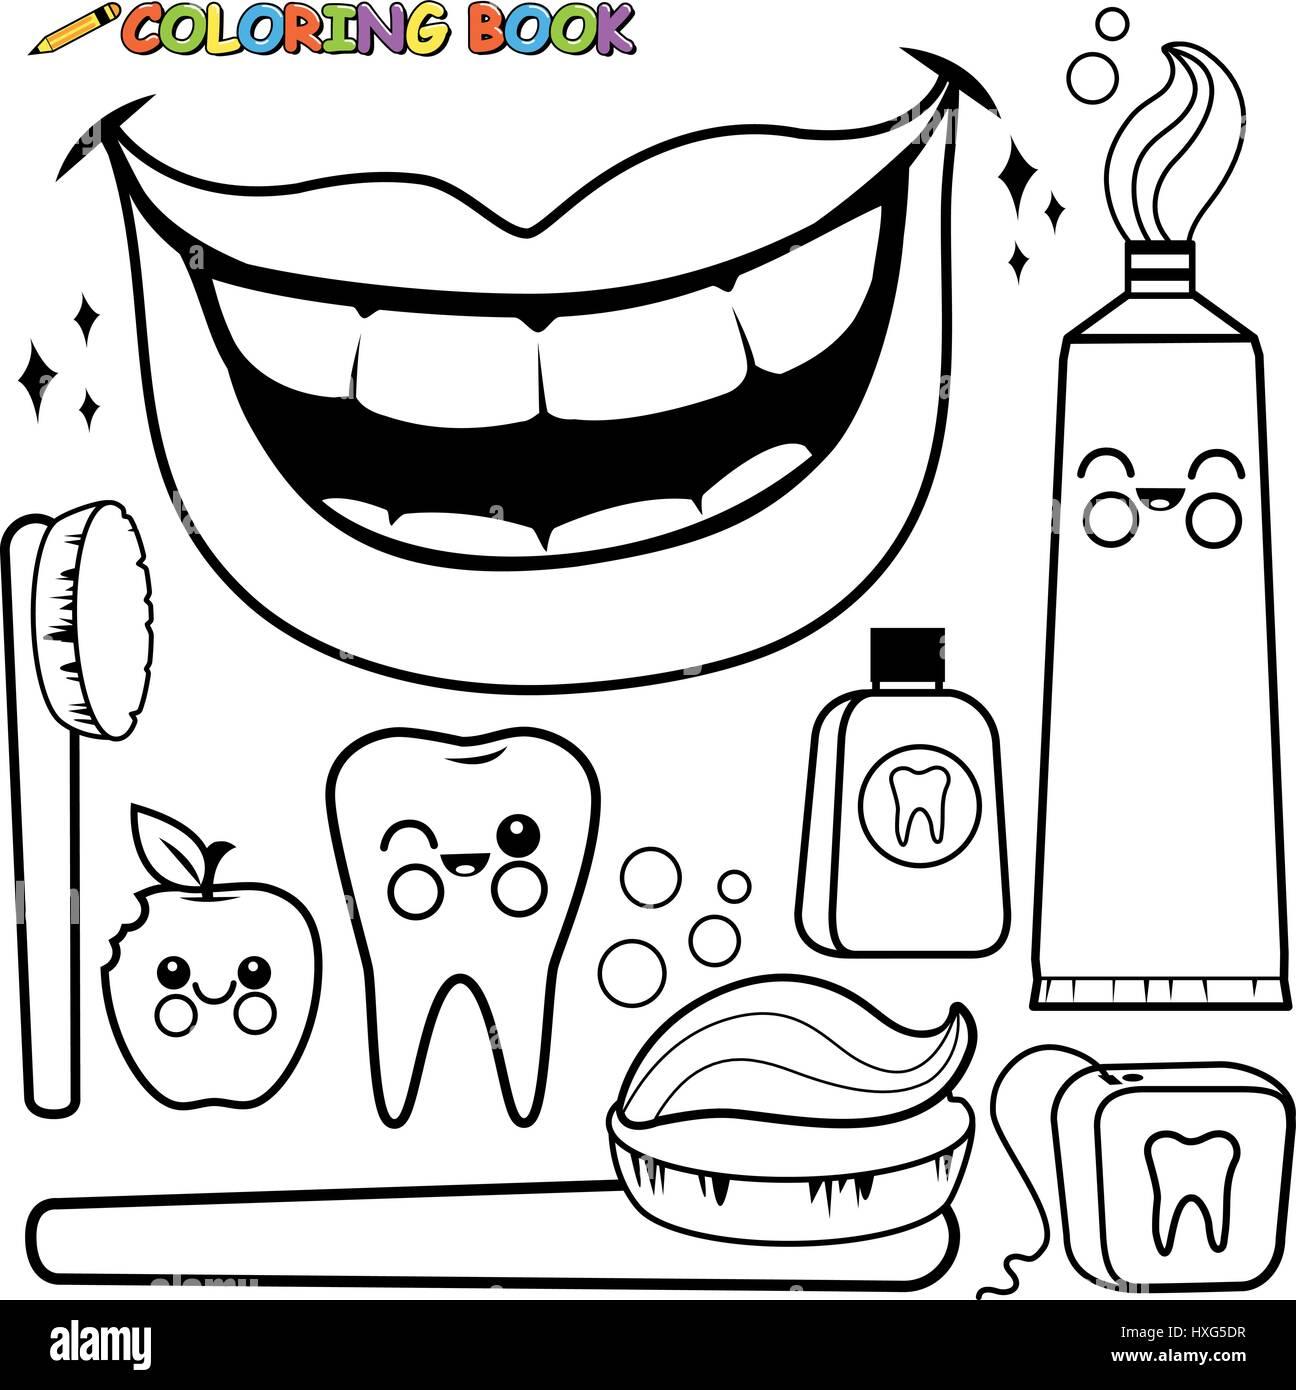 Dental Hygiene Drawing Stock Photos Amp Dental Hygiene Drawing Stock Images